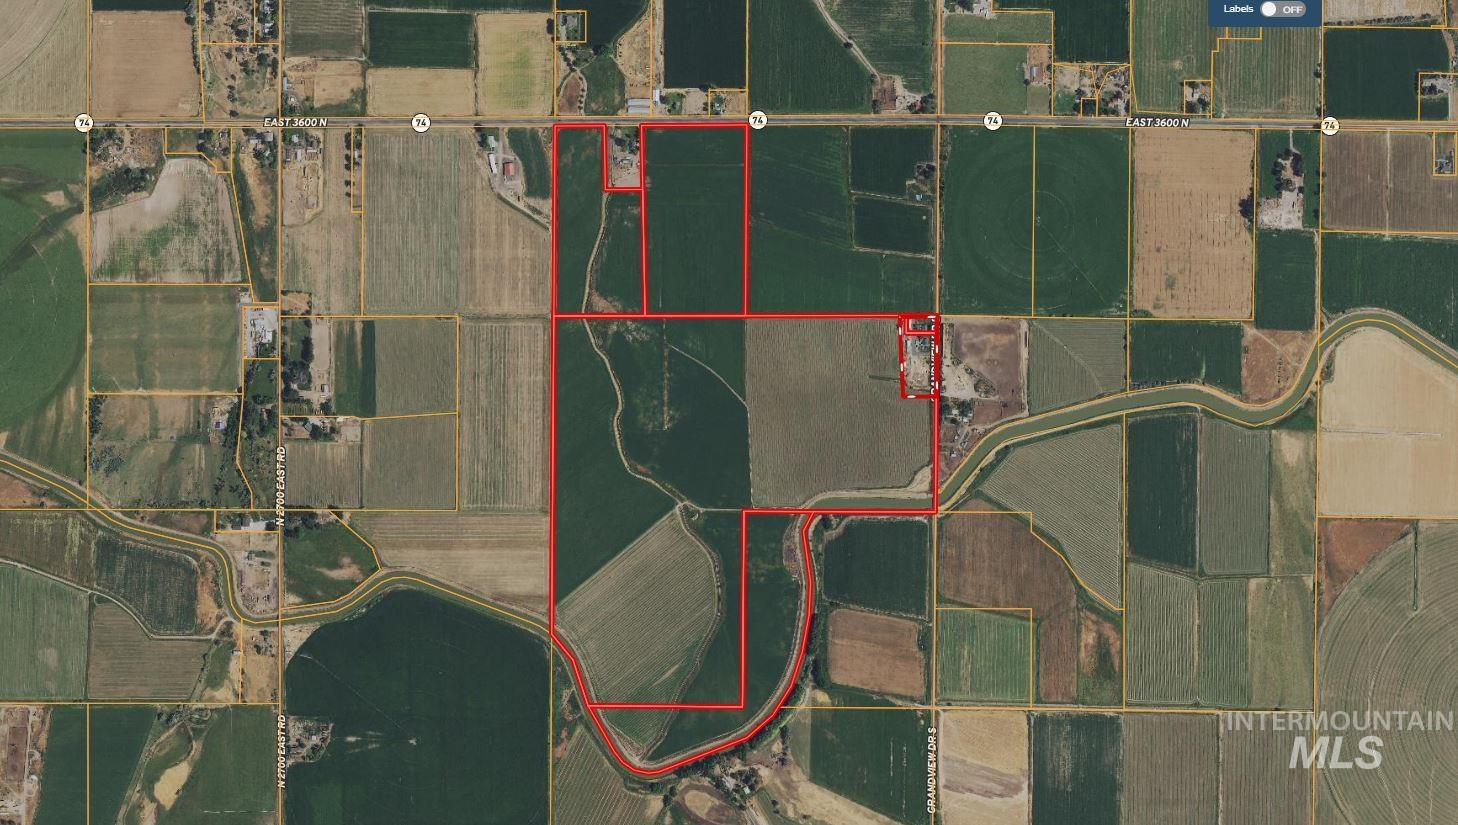 3571 N 2800 E Property Photo 1